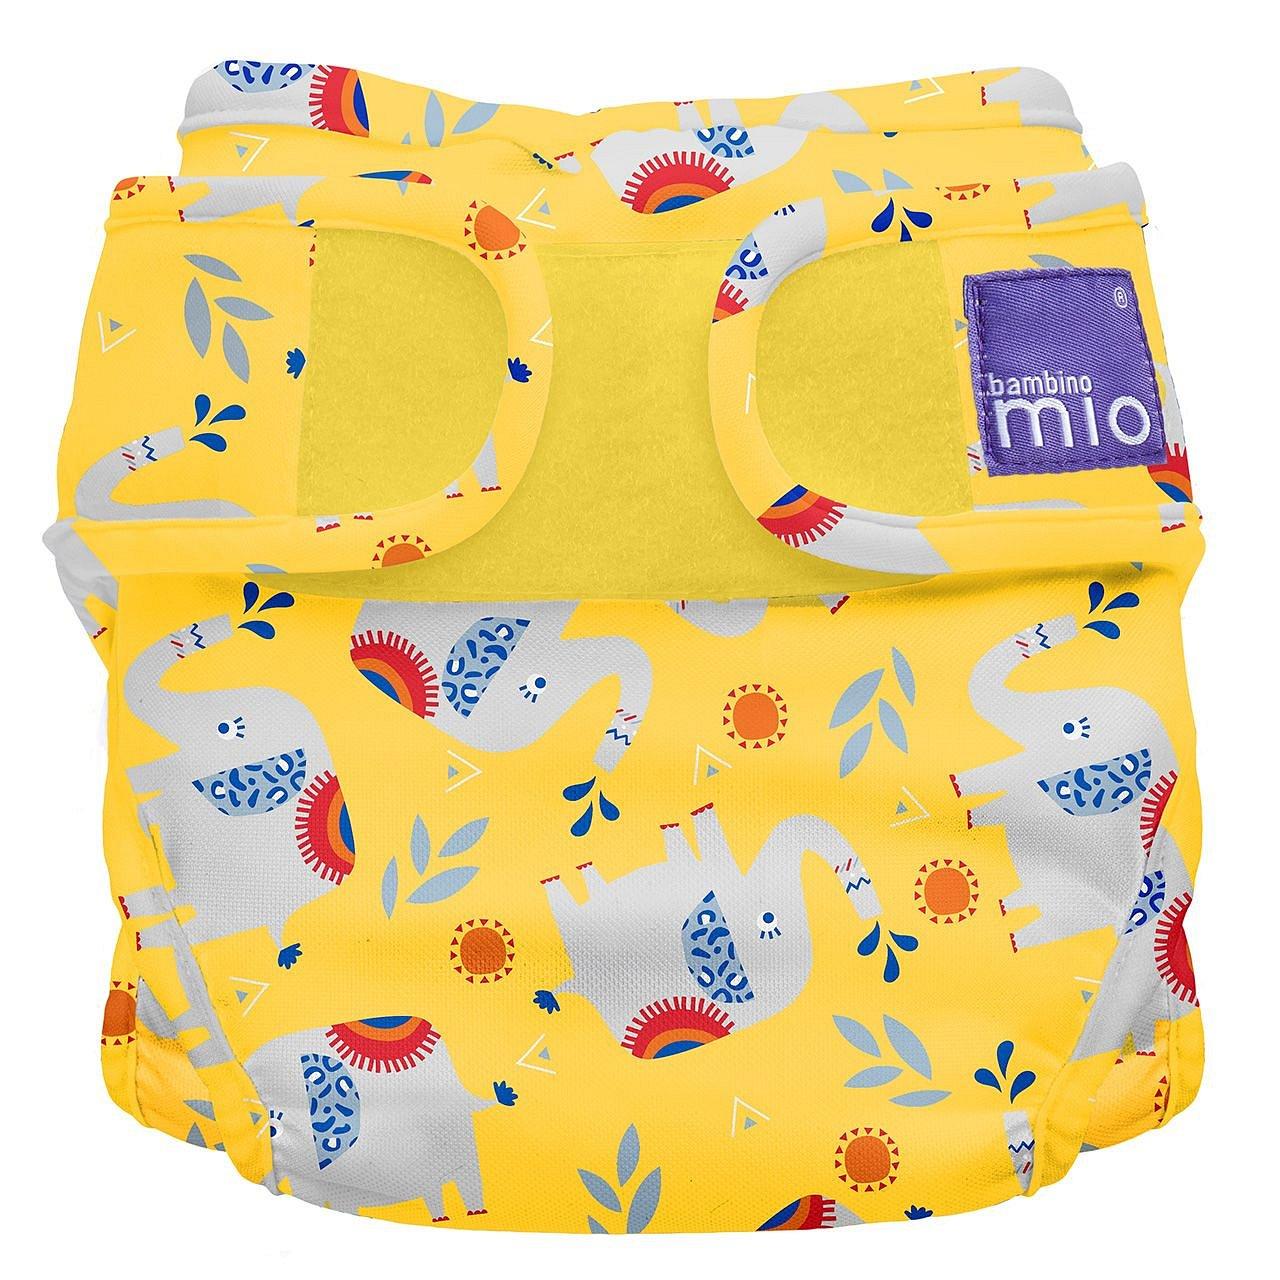 Bambino Mio Miosoft plenkové kalhotky Elephant Stomp 3-9kg